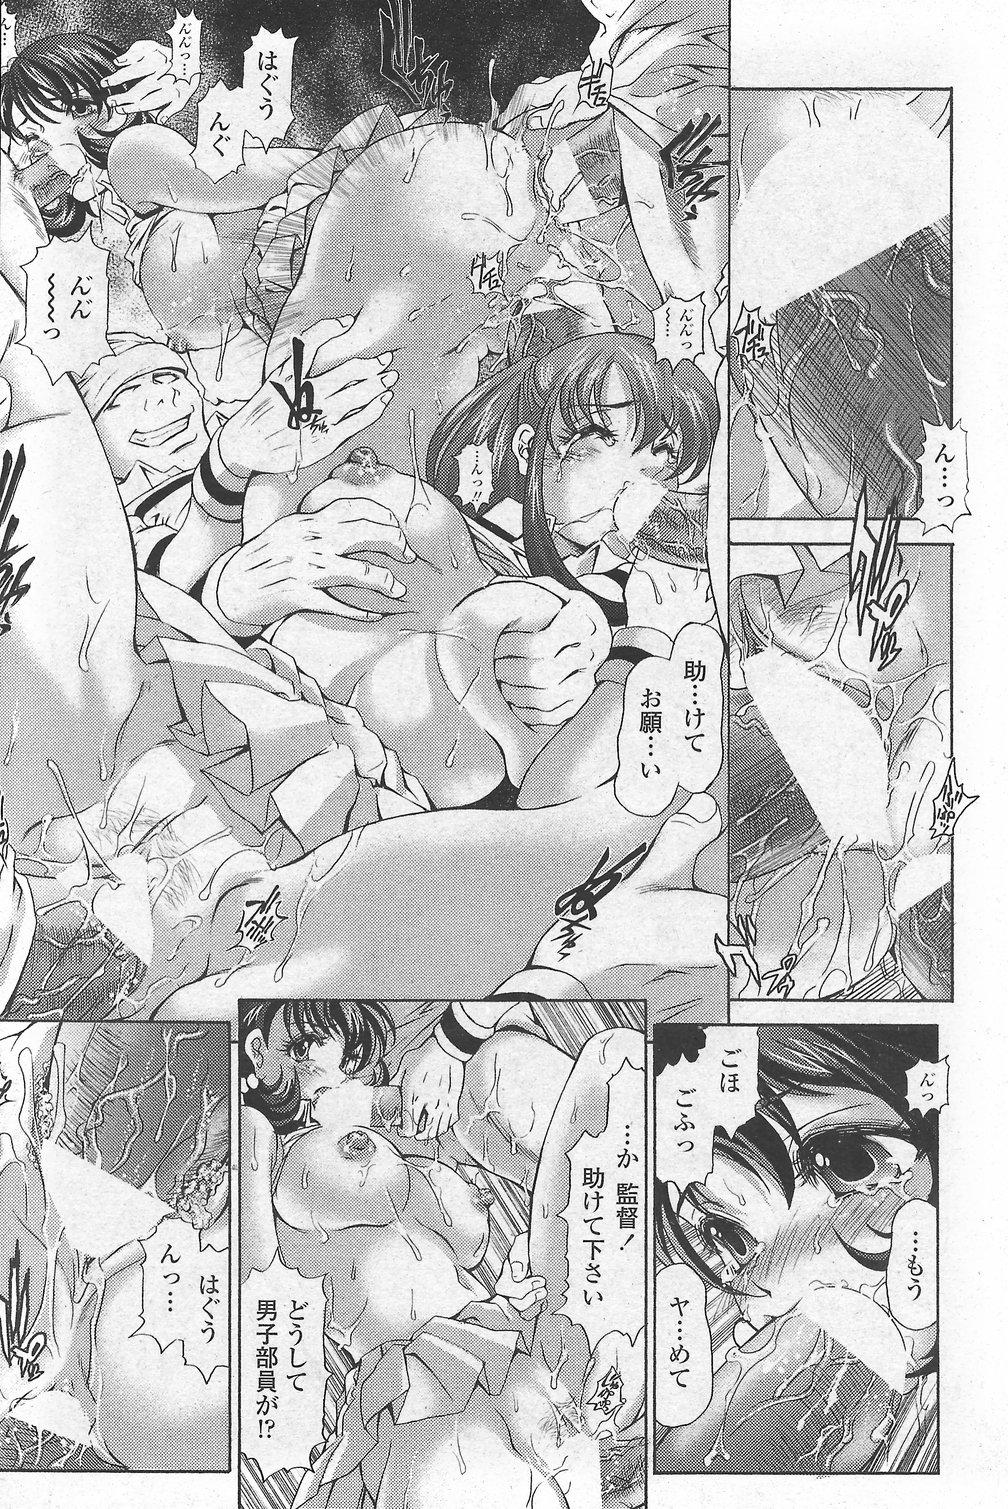 COMIC Penguin Club Sanzokuban 2007-10 Vol. 225 208